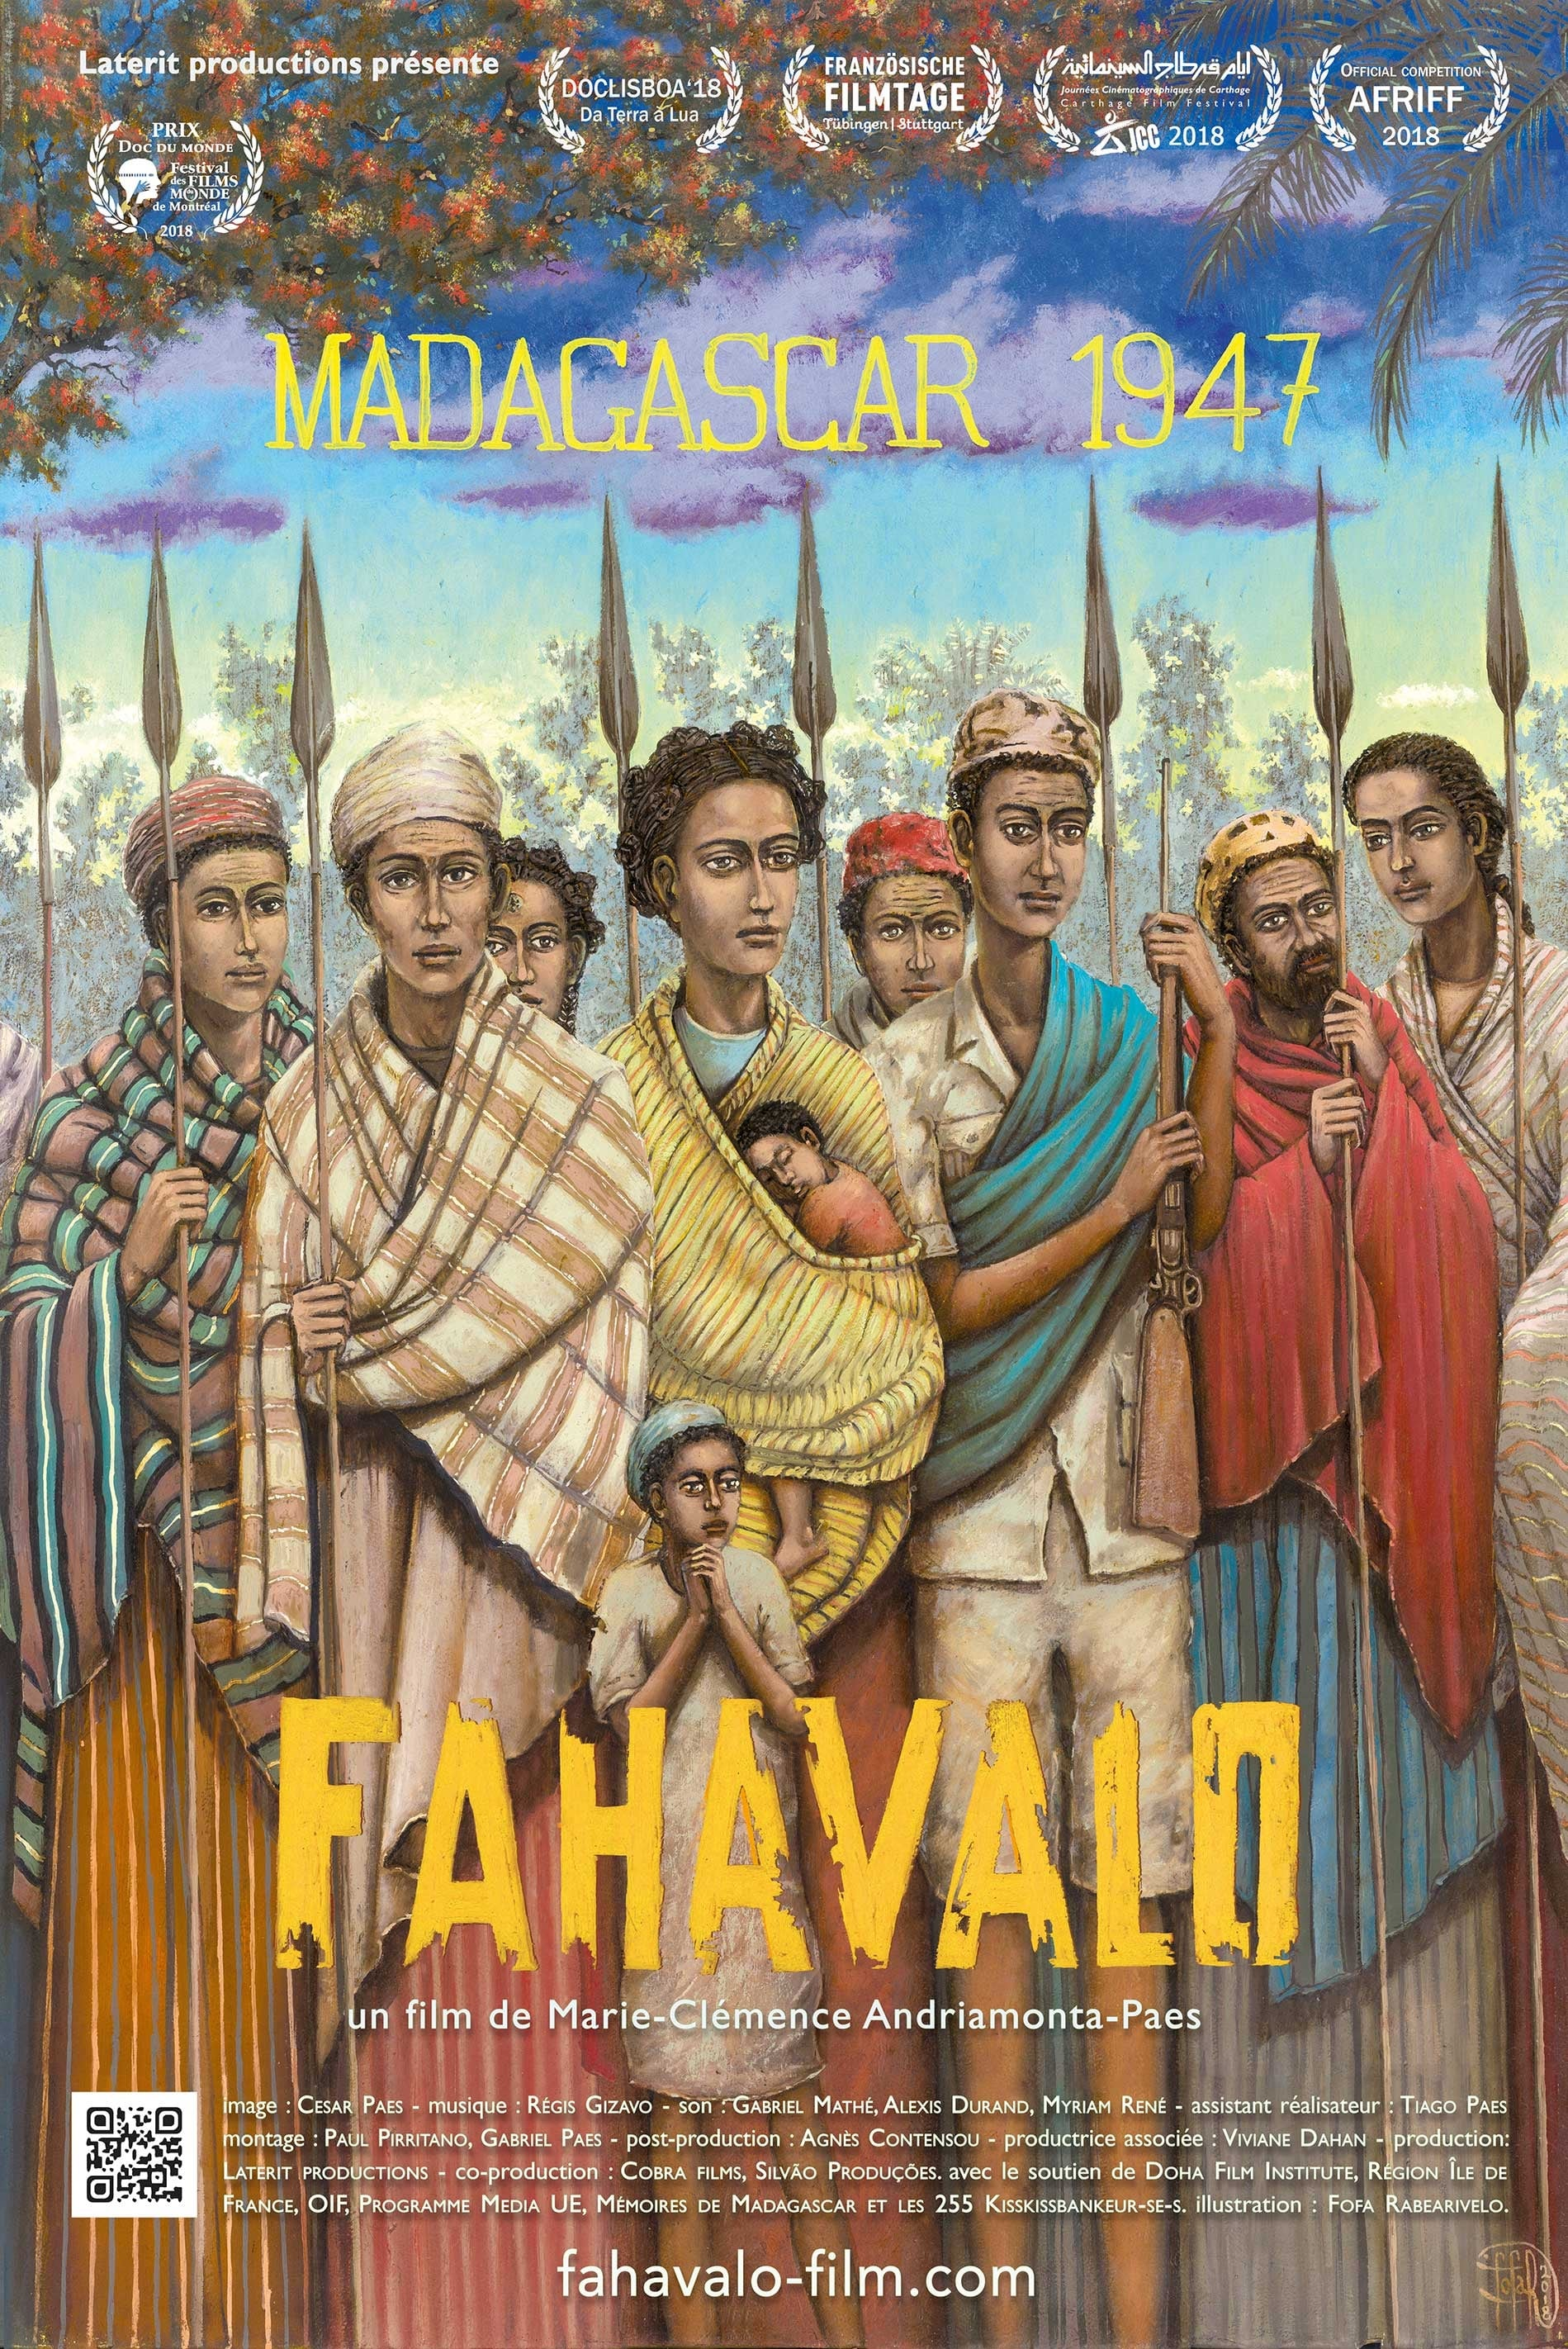 Fahavalo, Madagascar 1947 streaming sur zone telechargement